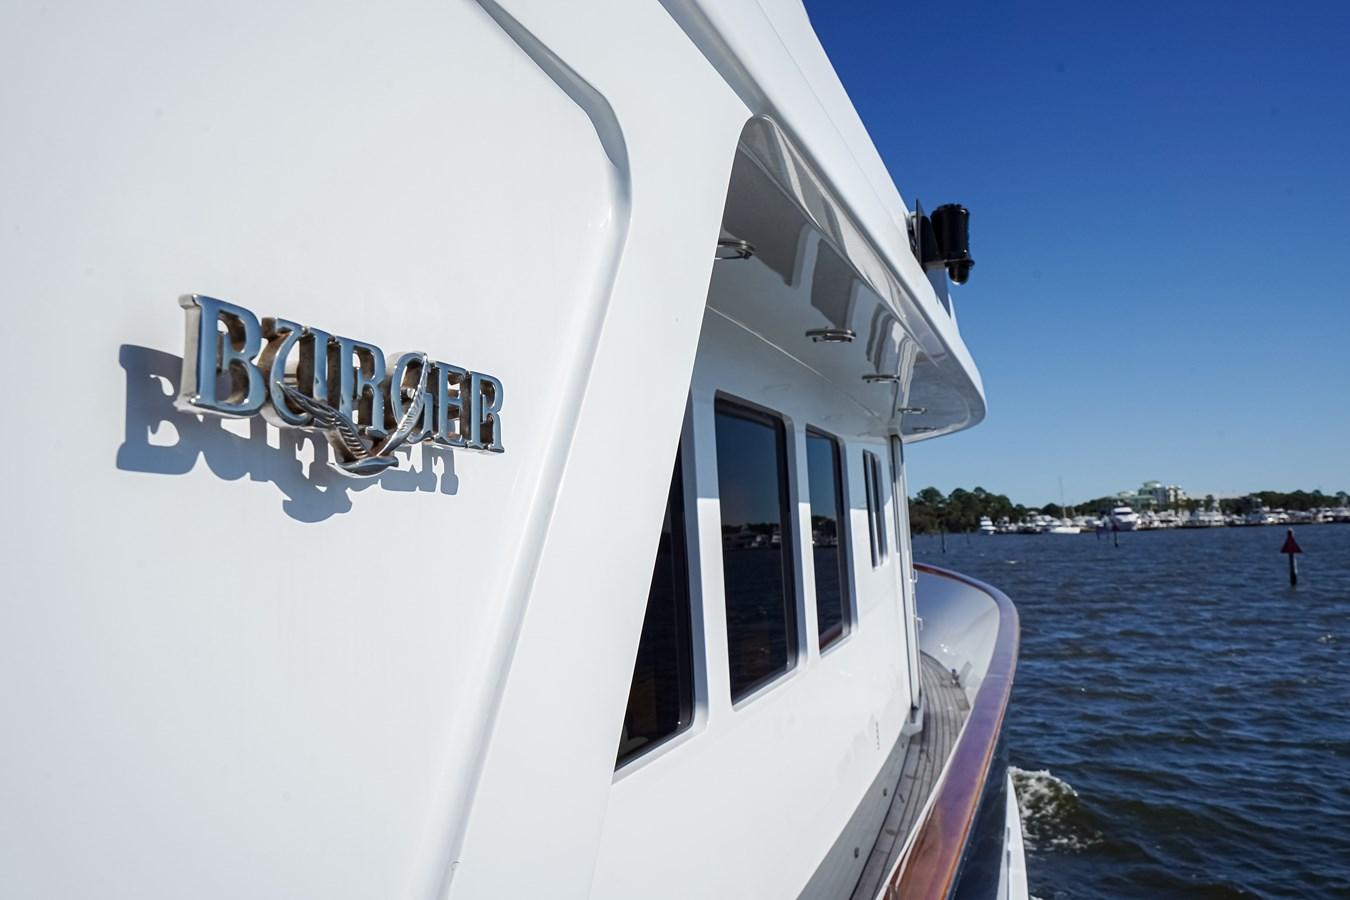 2011 85 Burger - Logo 2001 BURGER 85 Motor Yacht Motor Yacht 2847224